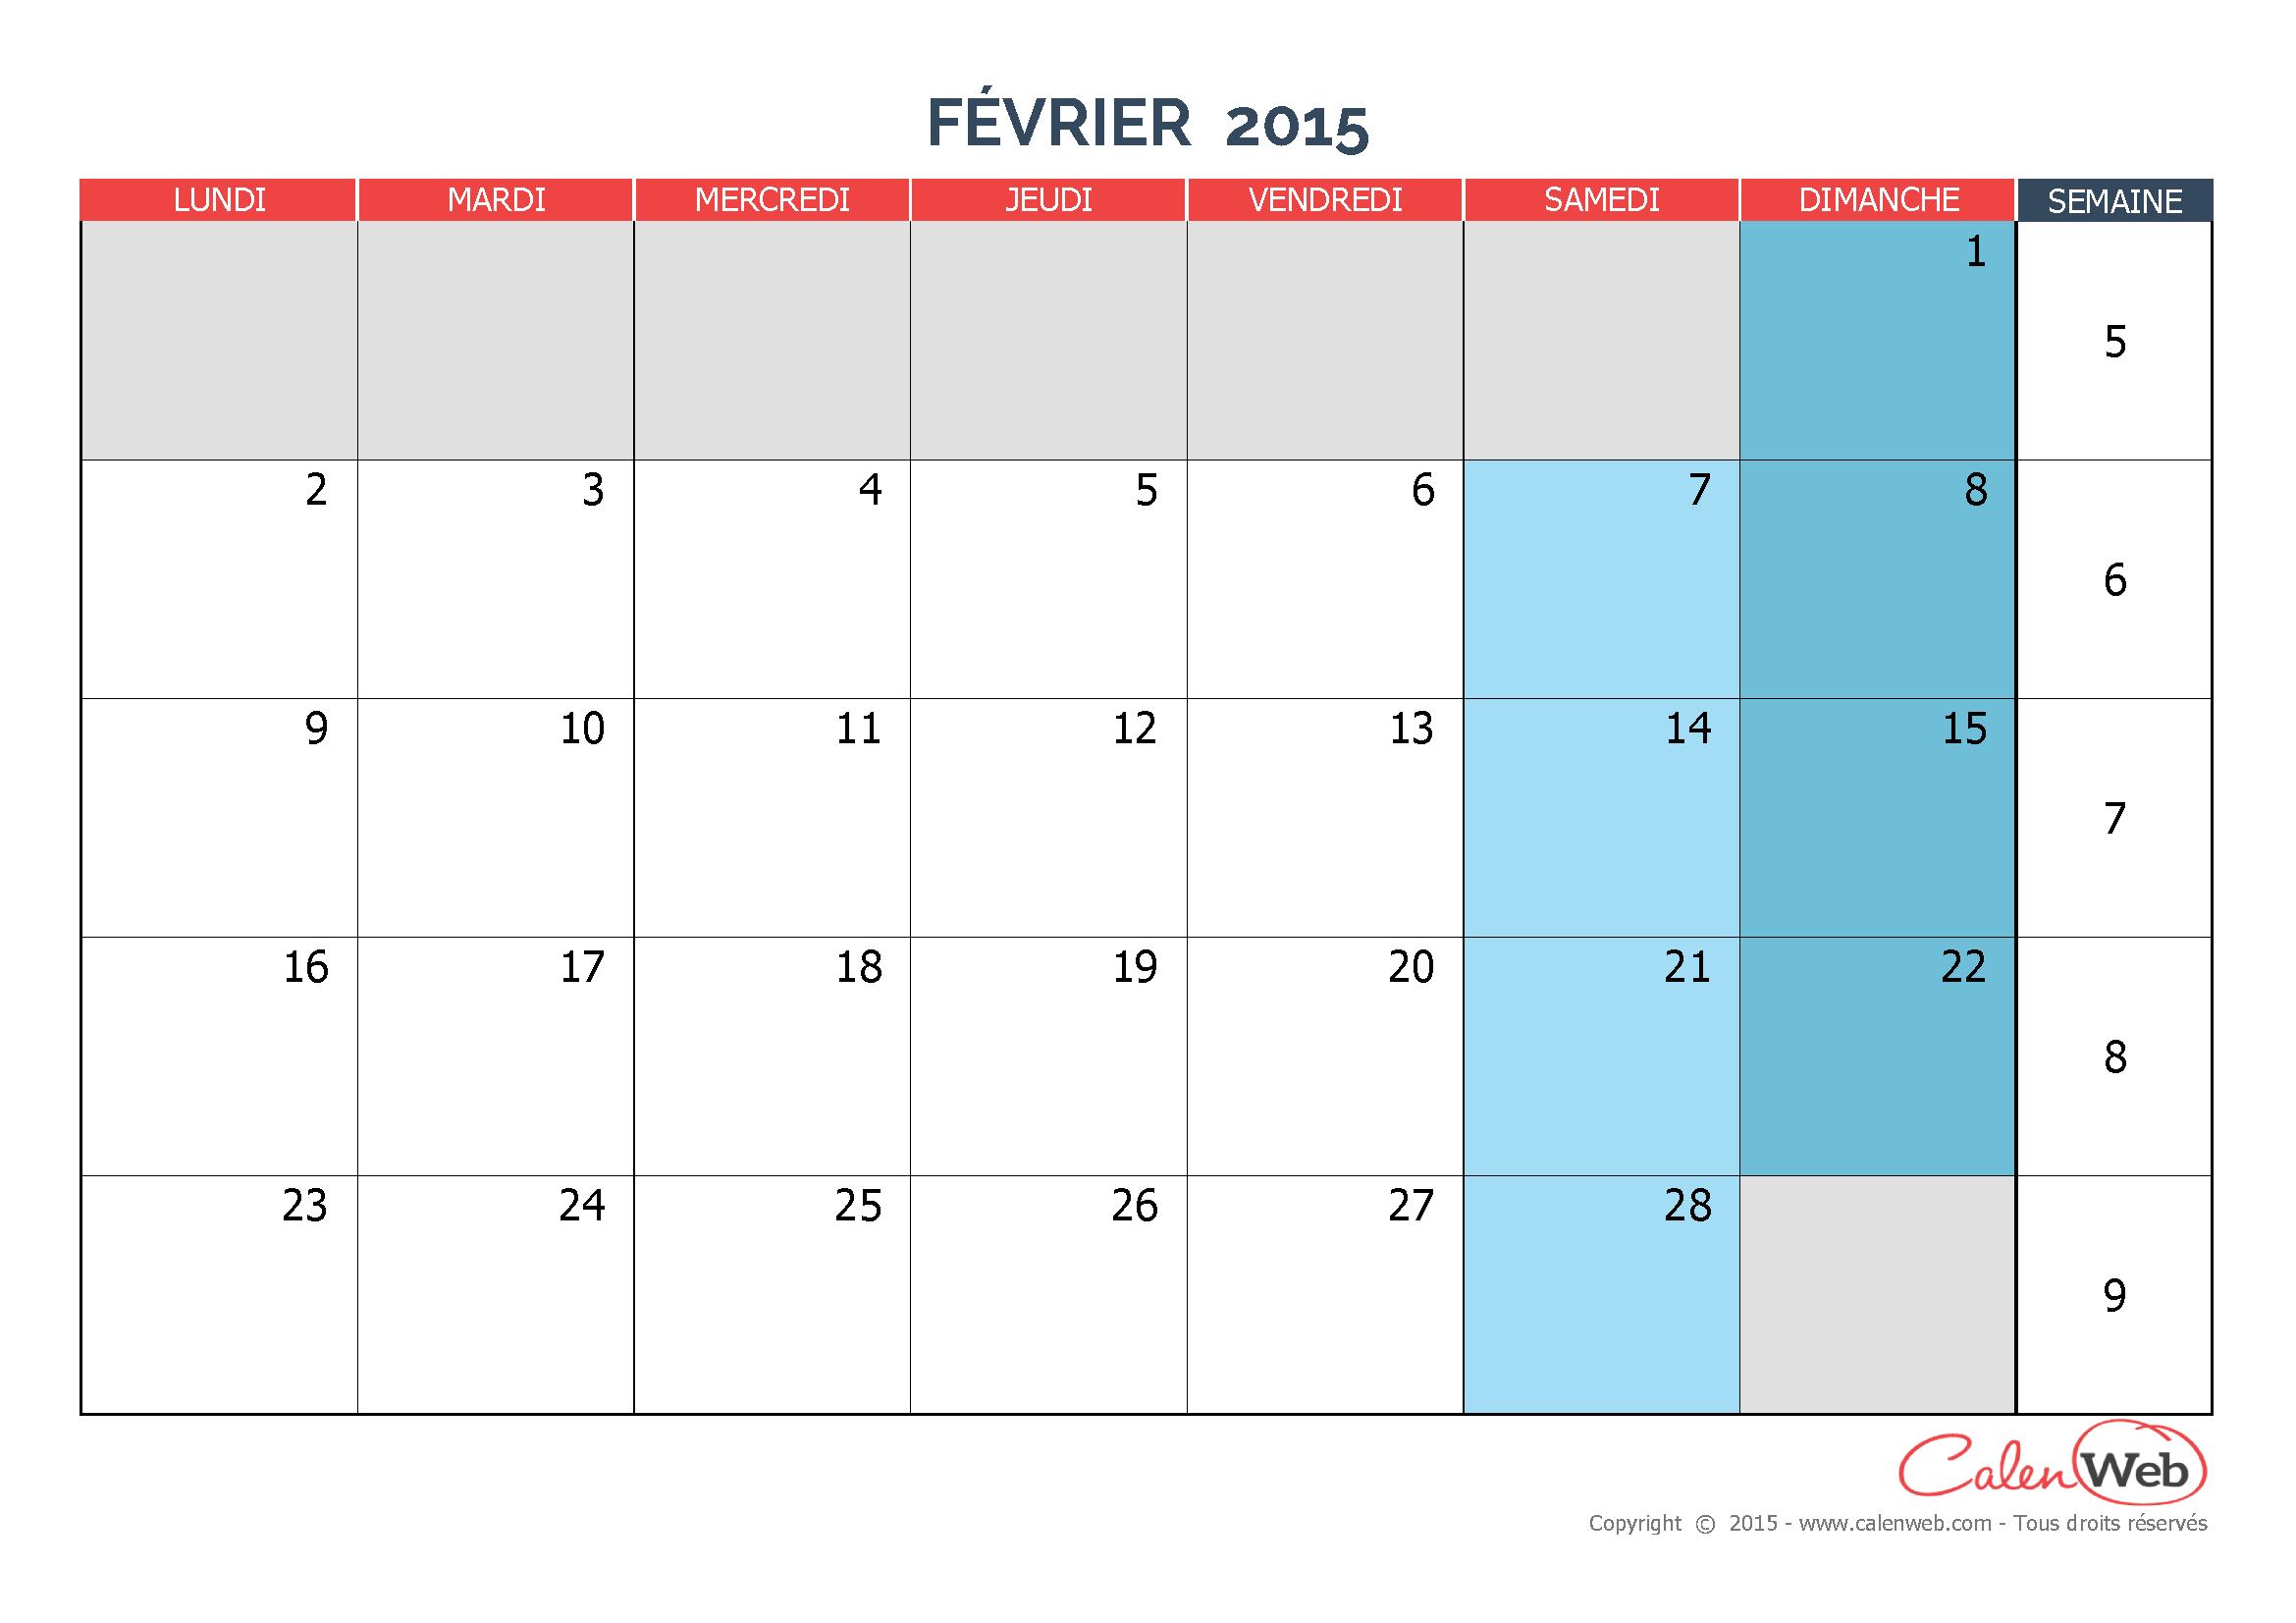 Calendrier mensuel mois de f vrier 2015 version vierge for Calendrier mural 2015